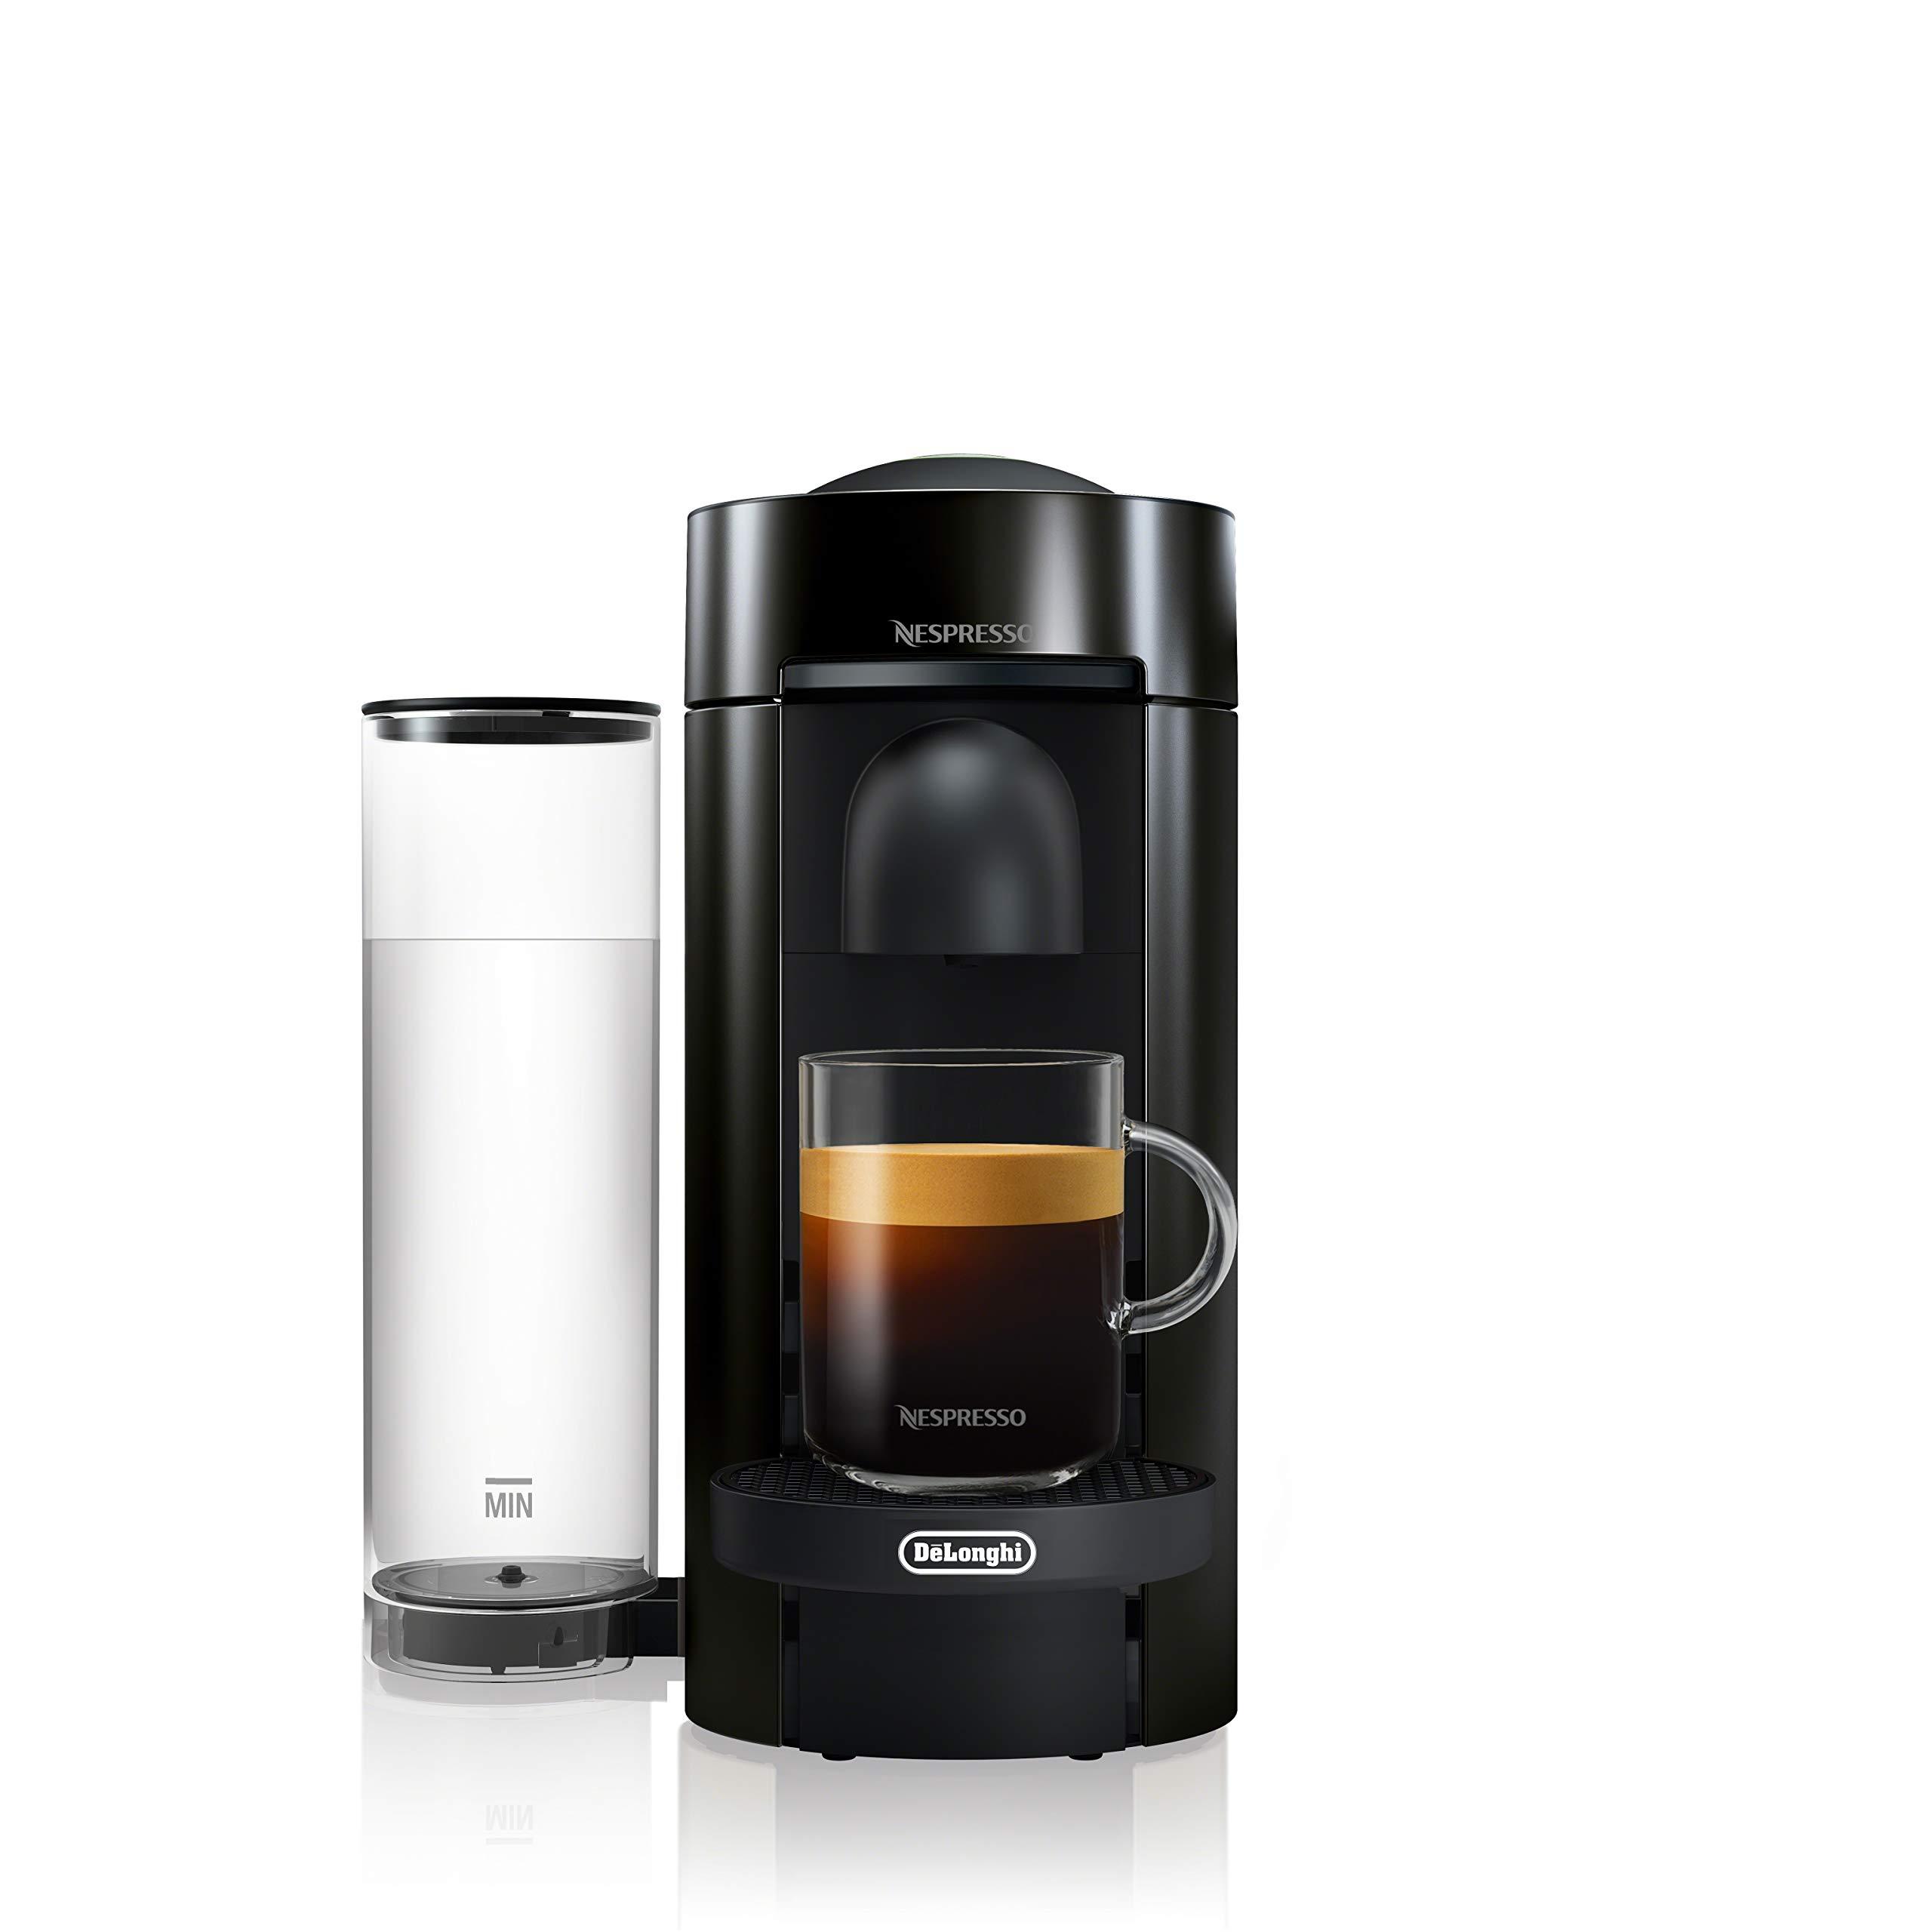 Nespresso Vertuo Plus by De'Longhi